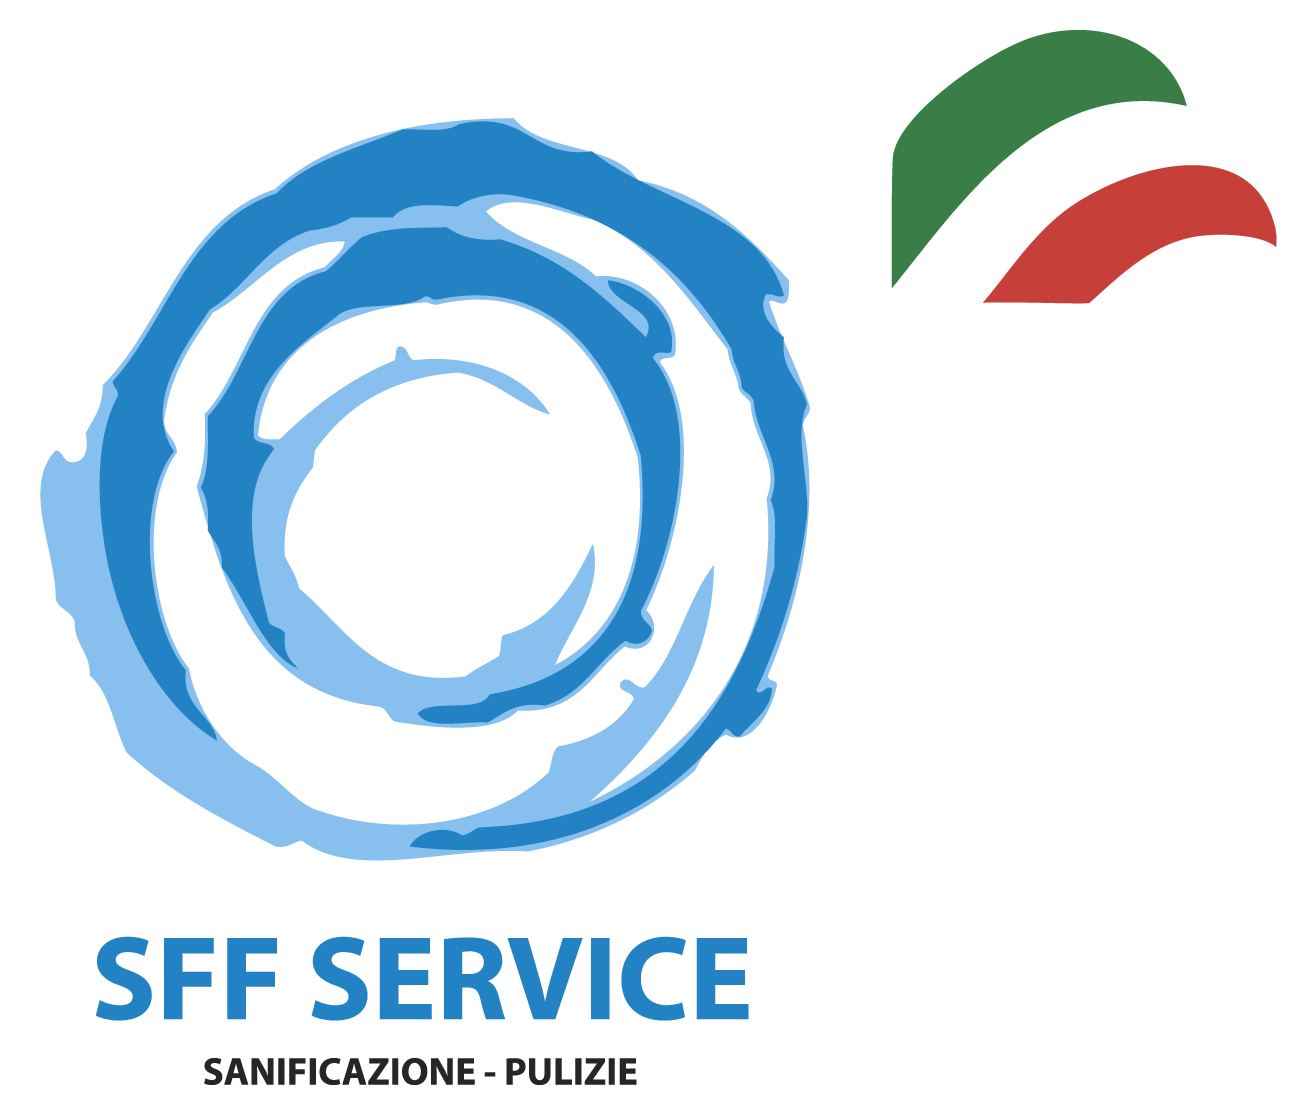 SFF Service